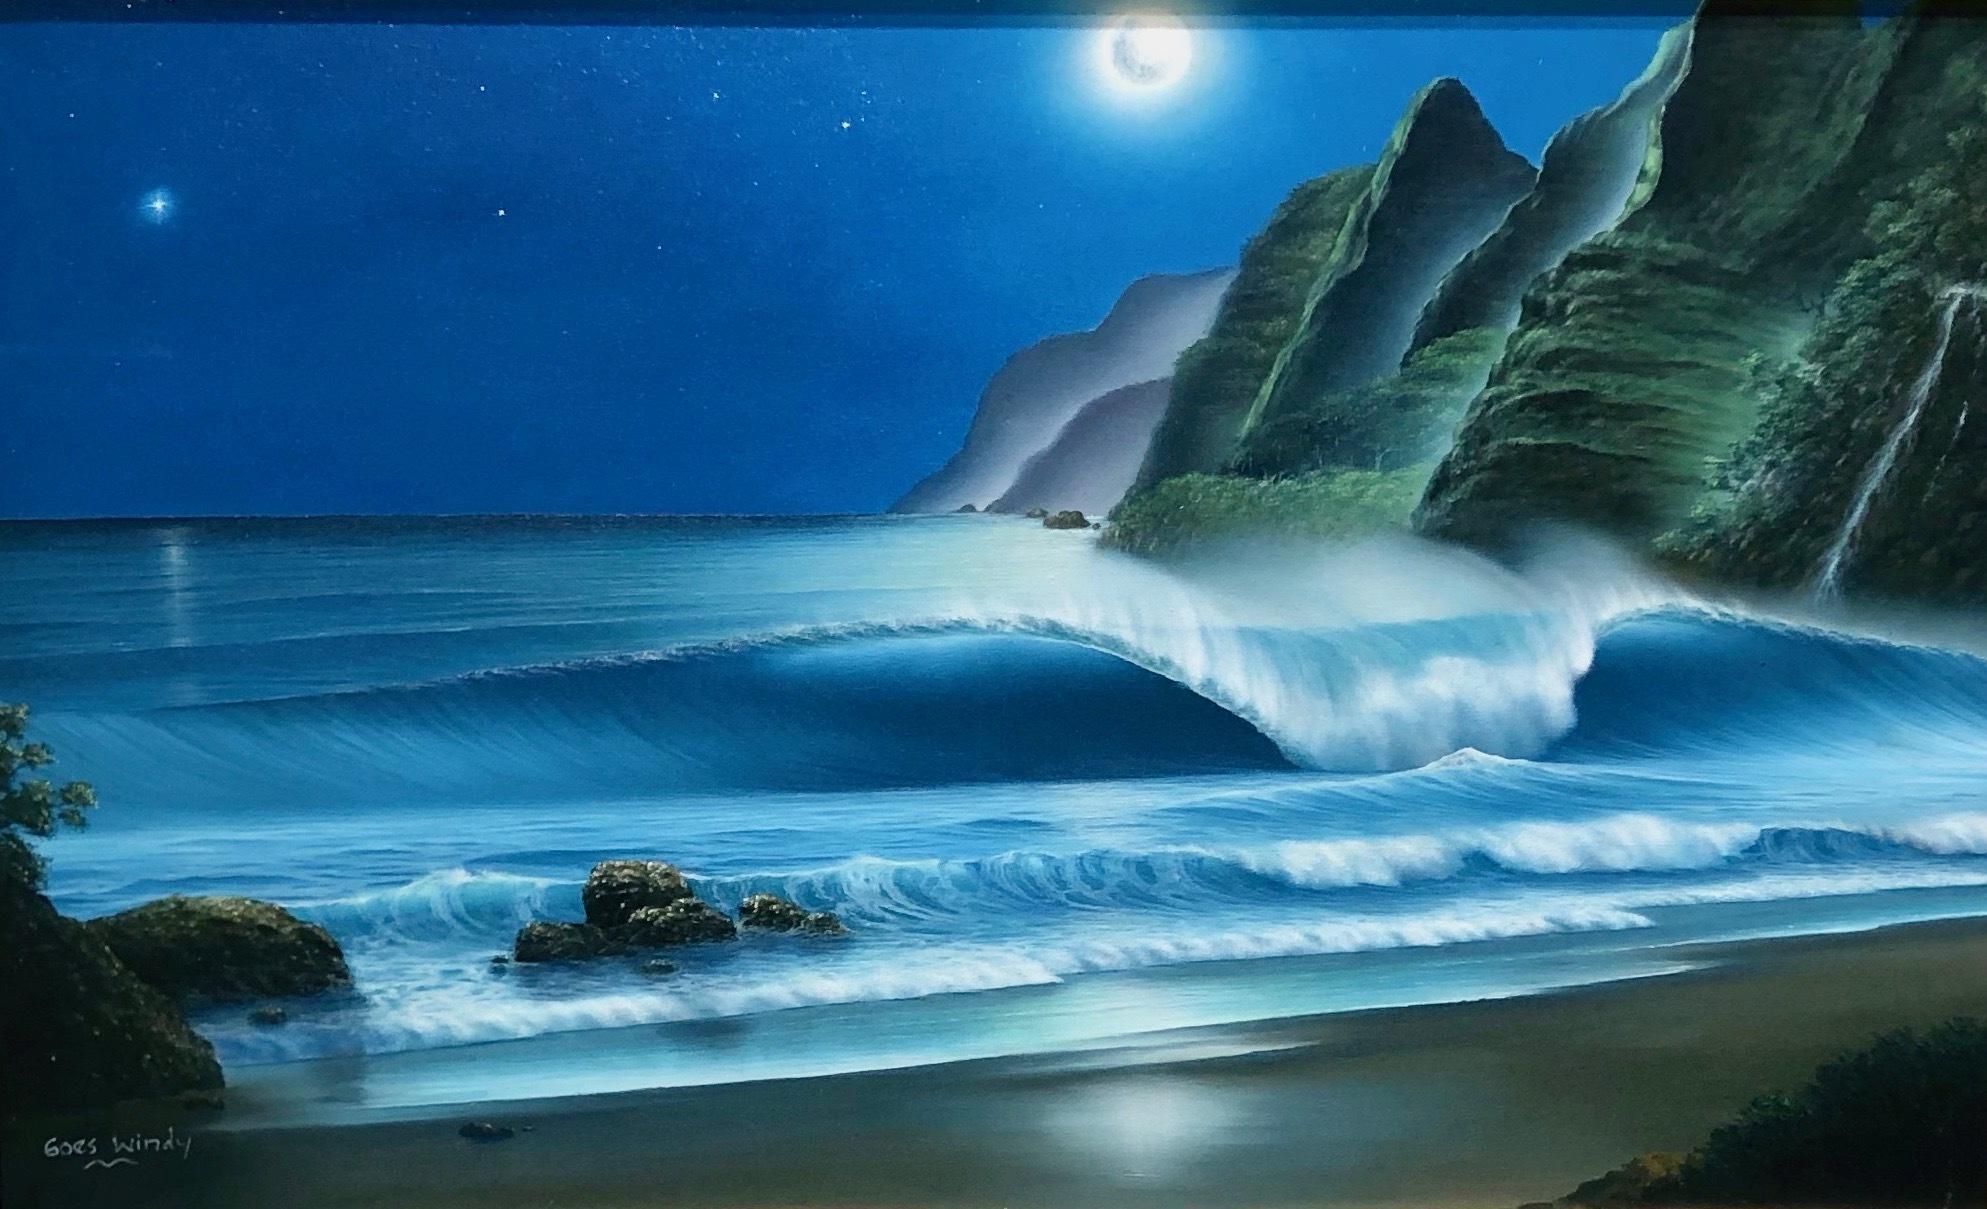 Dreamland Wave Art 特別製作品